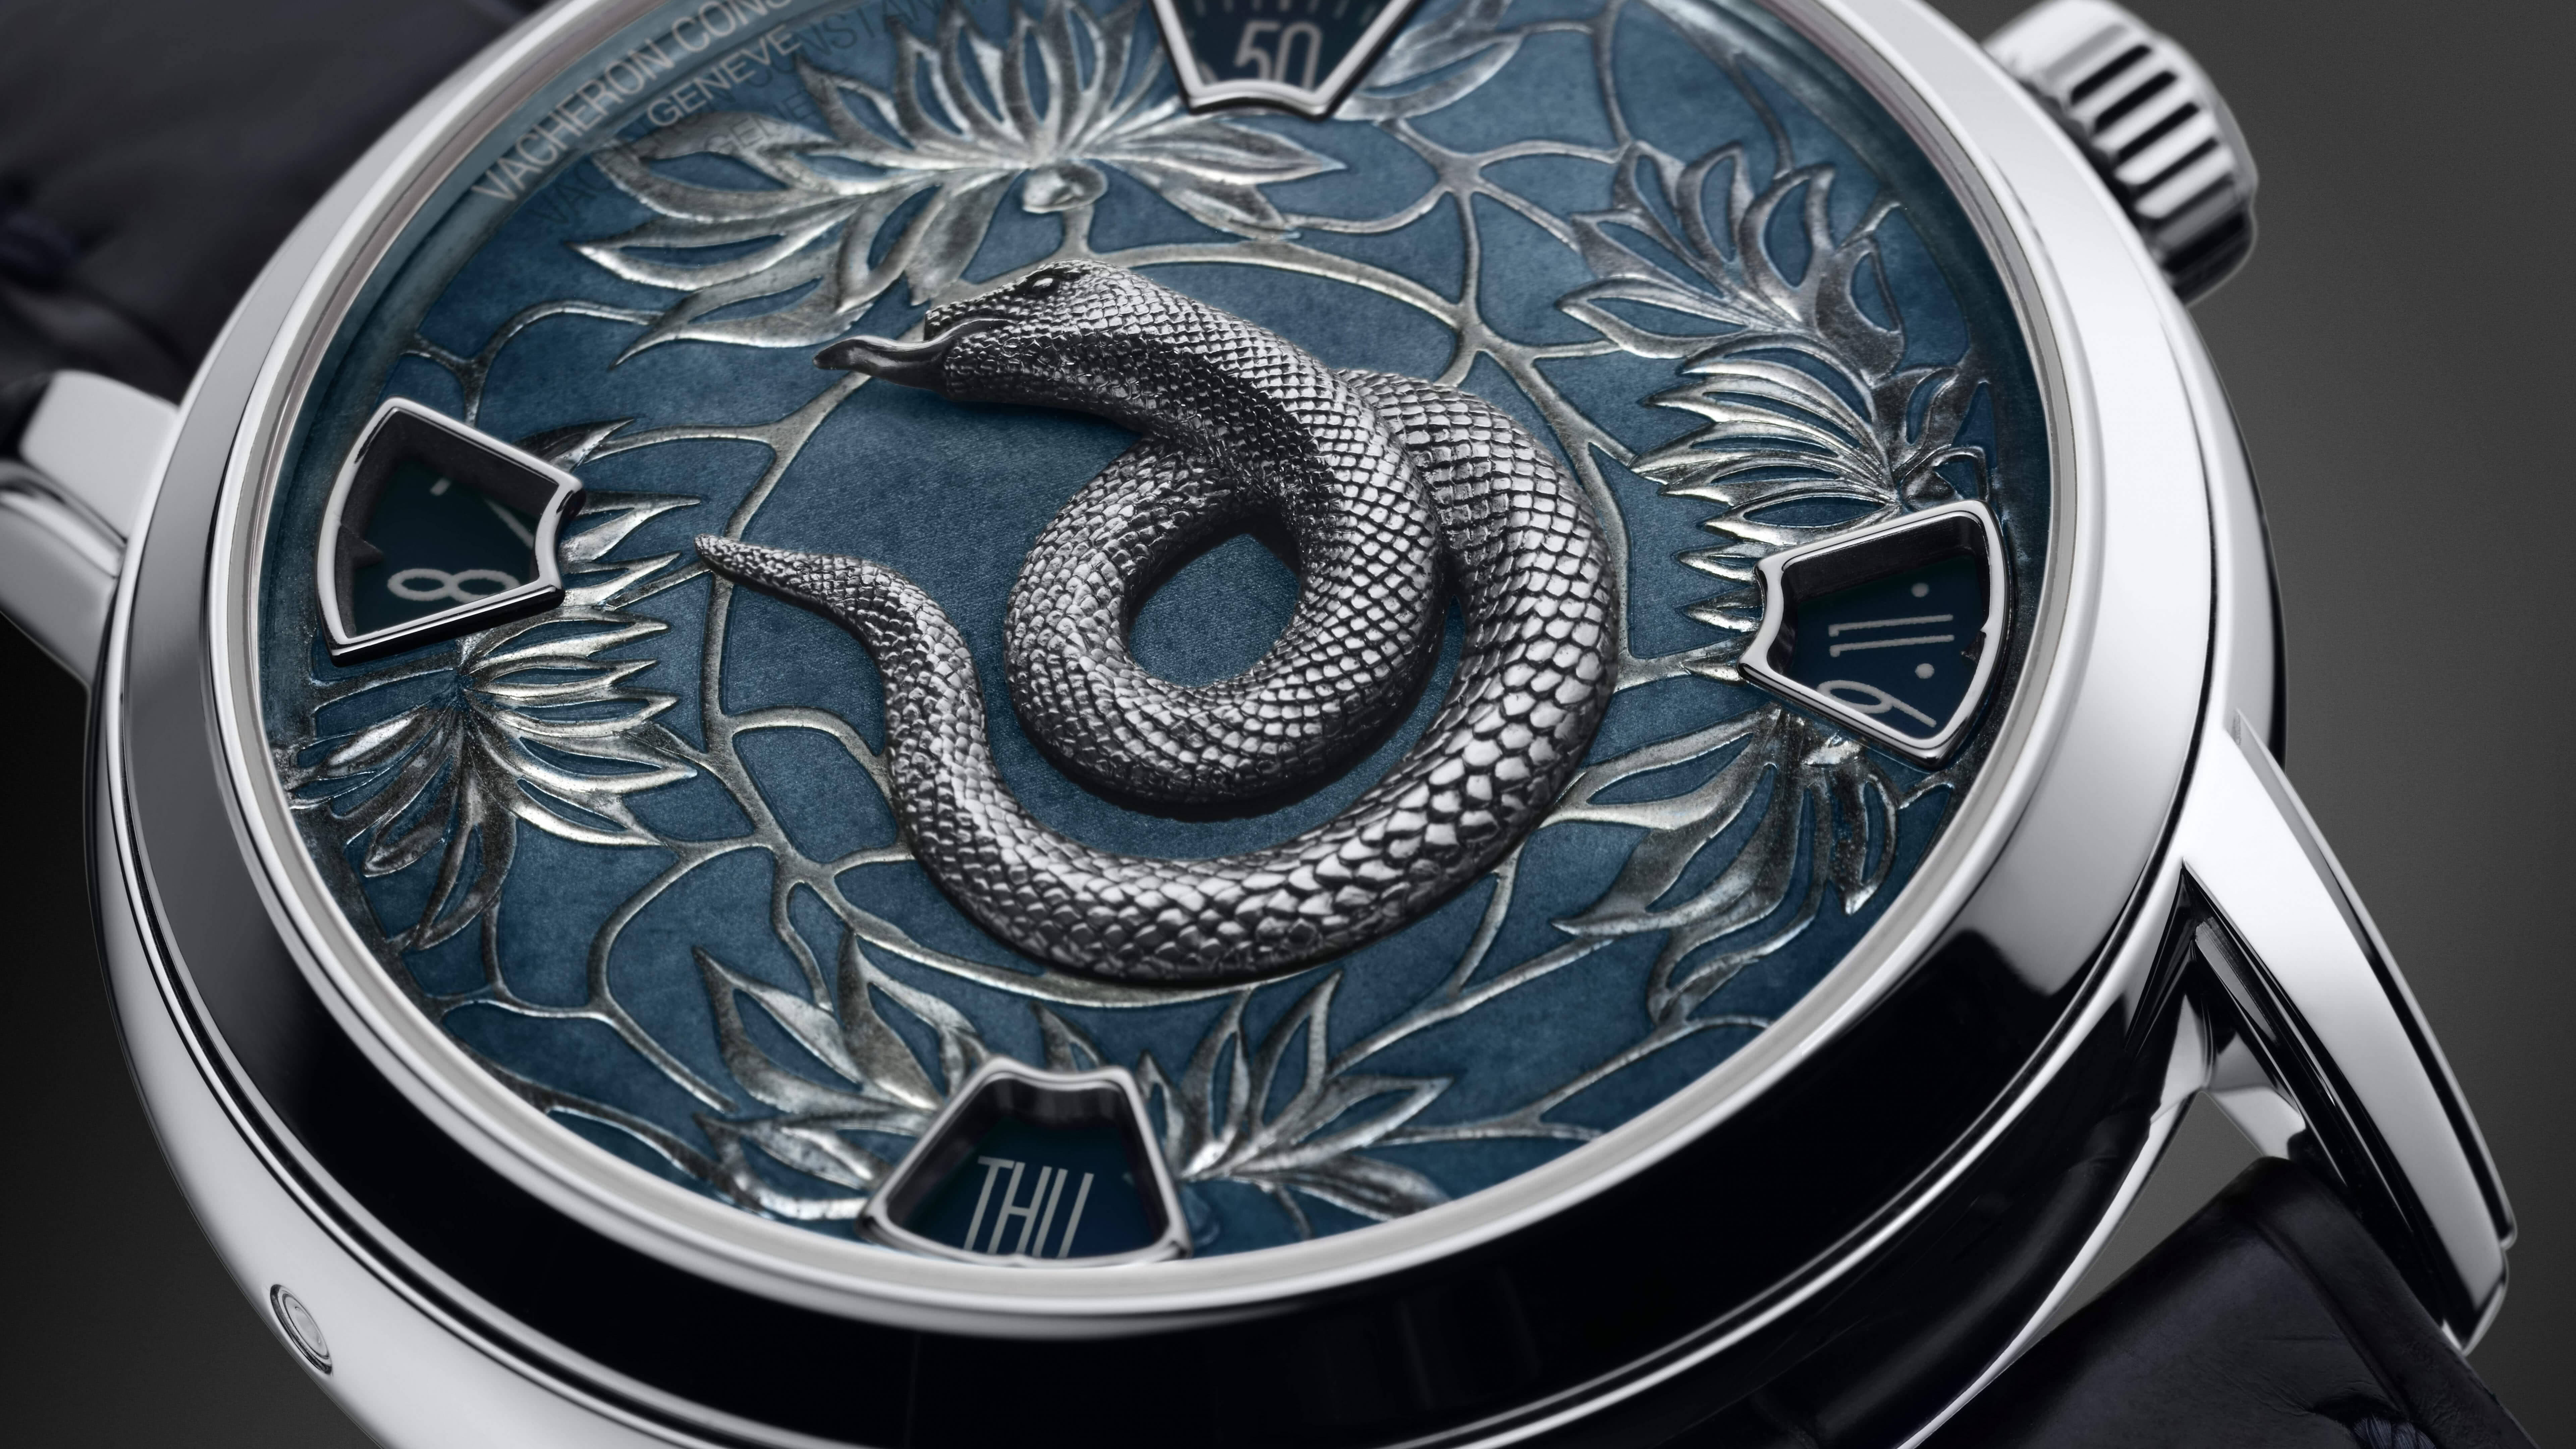 vacheron constantin year of the snake timepiece 8k wallpaper